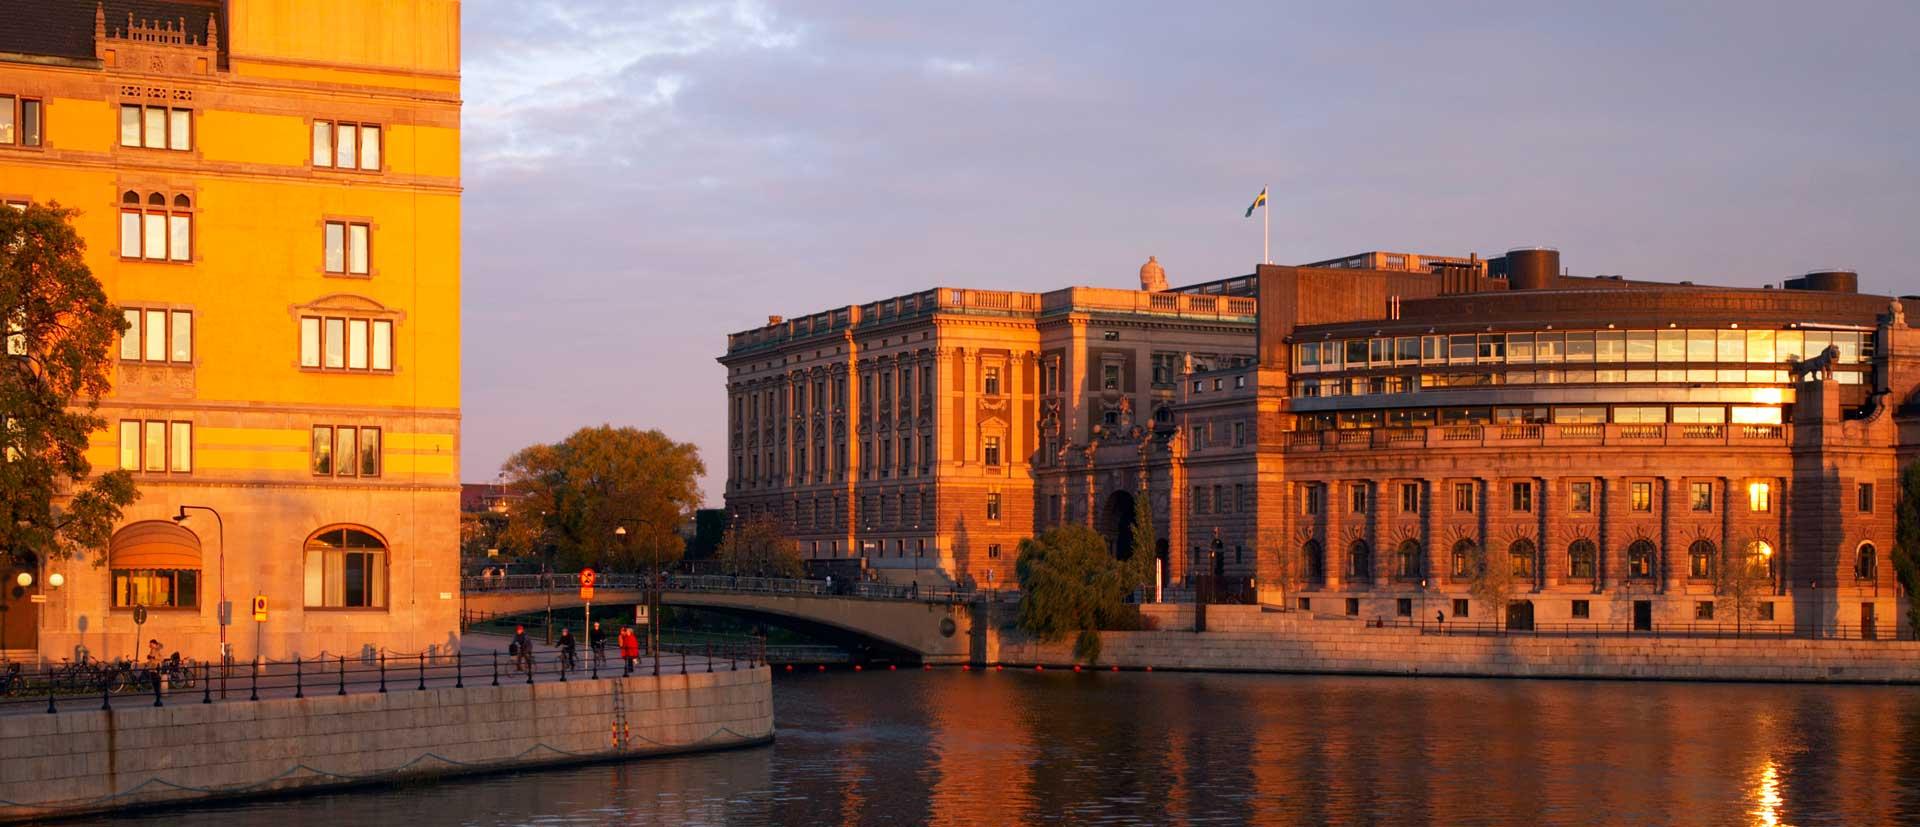 The Swedish Parliament House